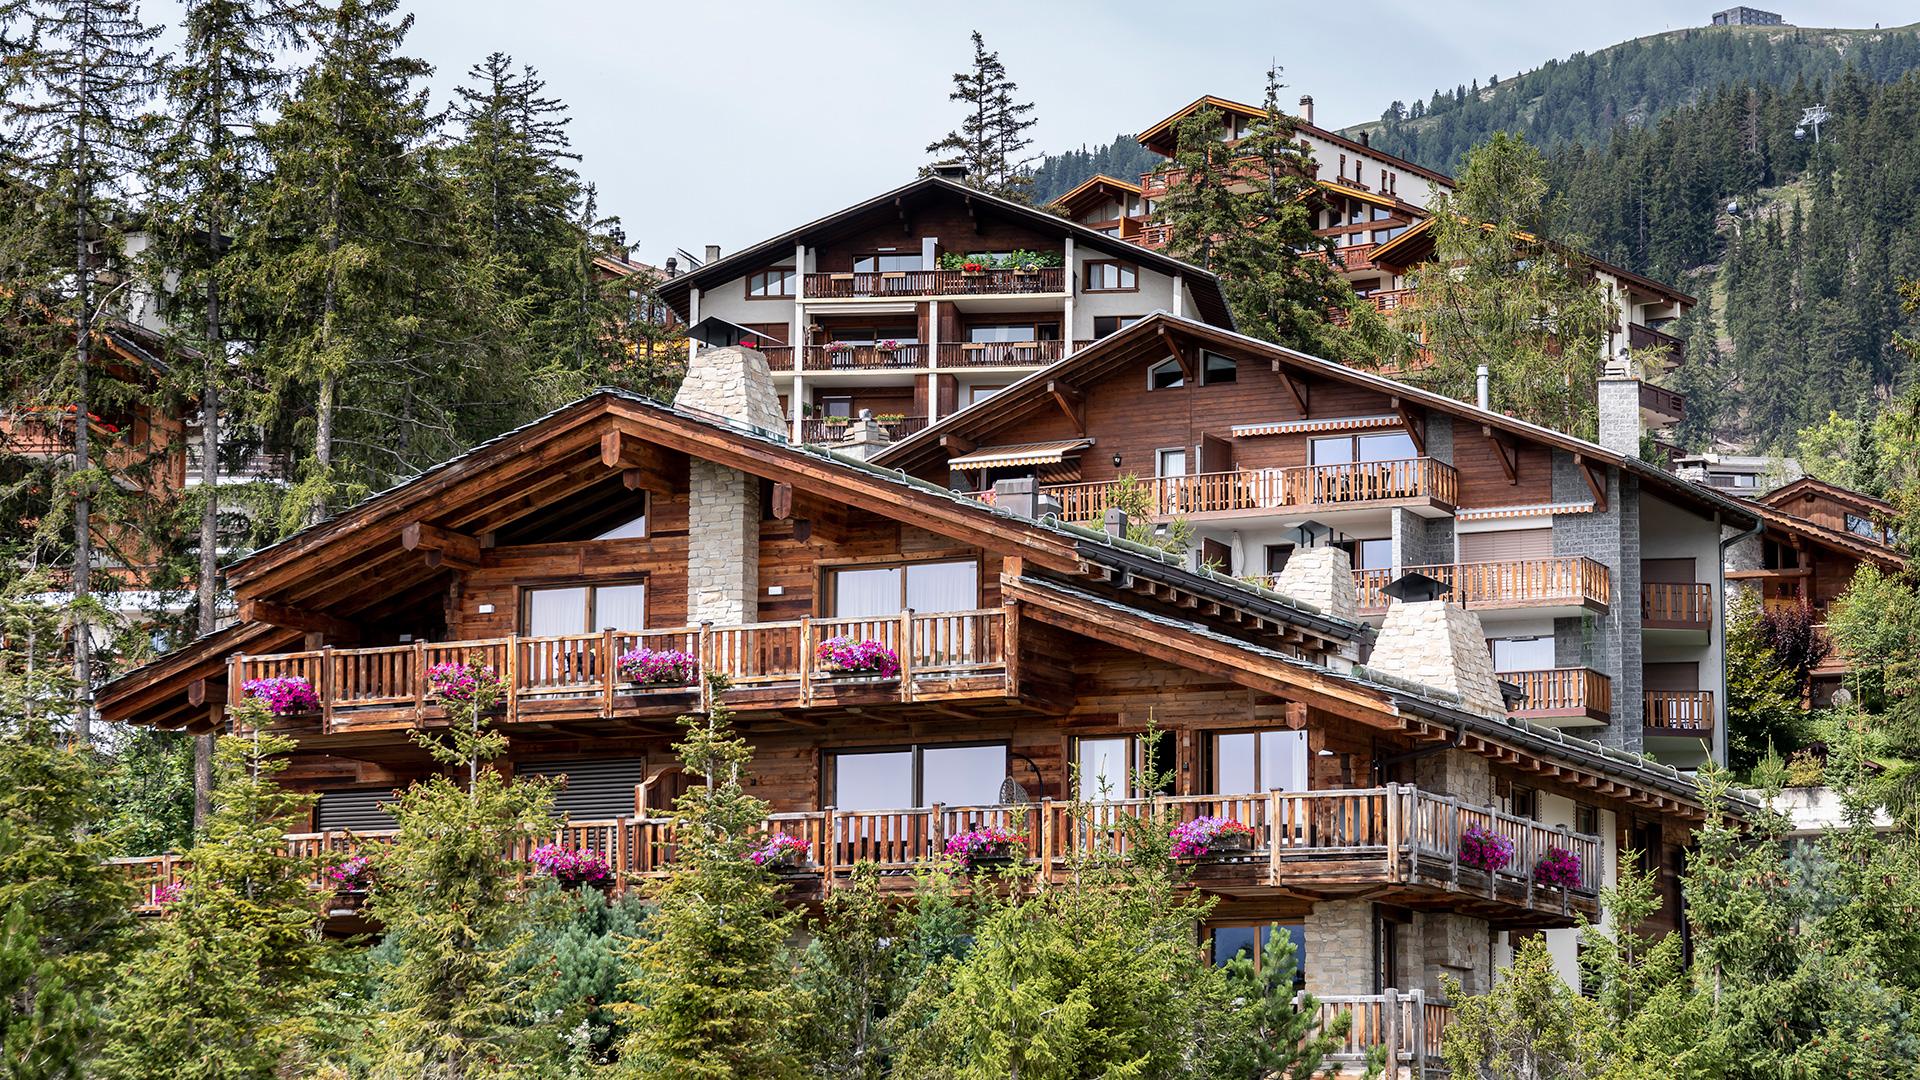 Manege Apt Apartments, Switzerland